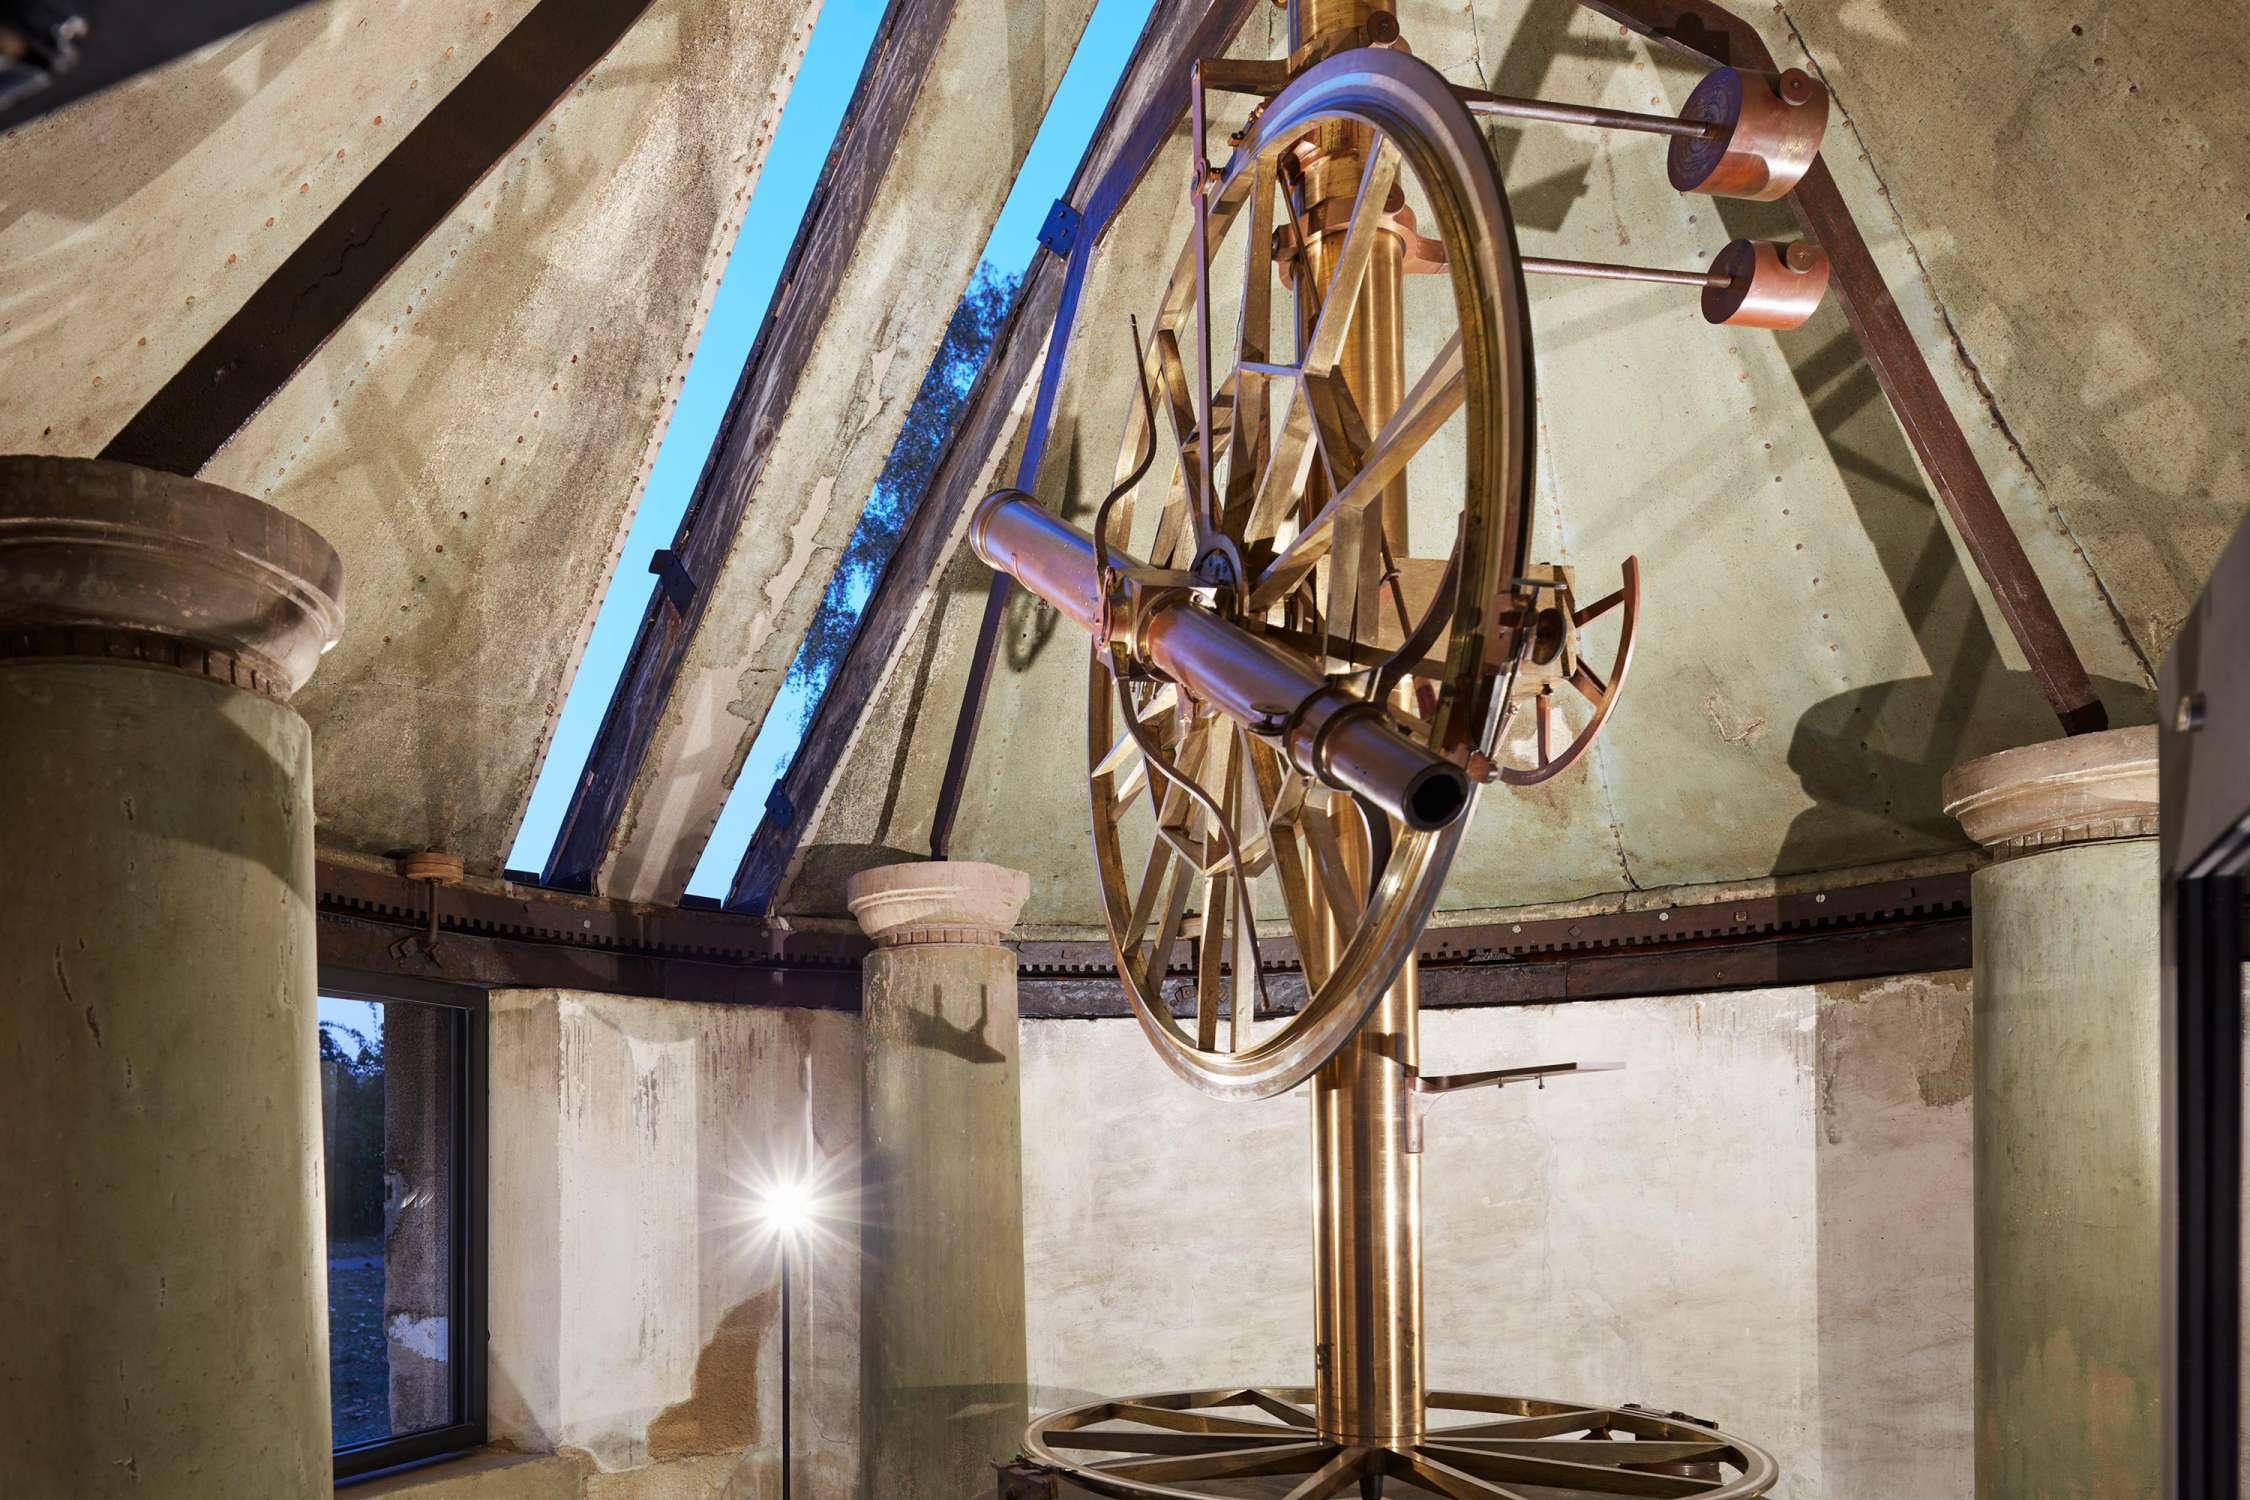 Johann Gottlieb Friedrich Bohnenberger Observatorium, Schloss Hohentübingen (9)